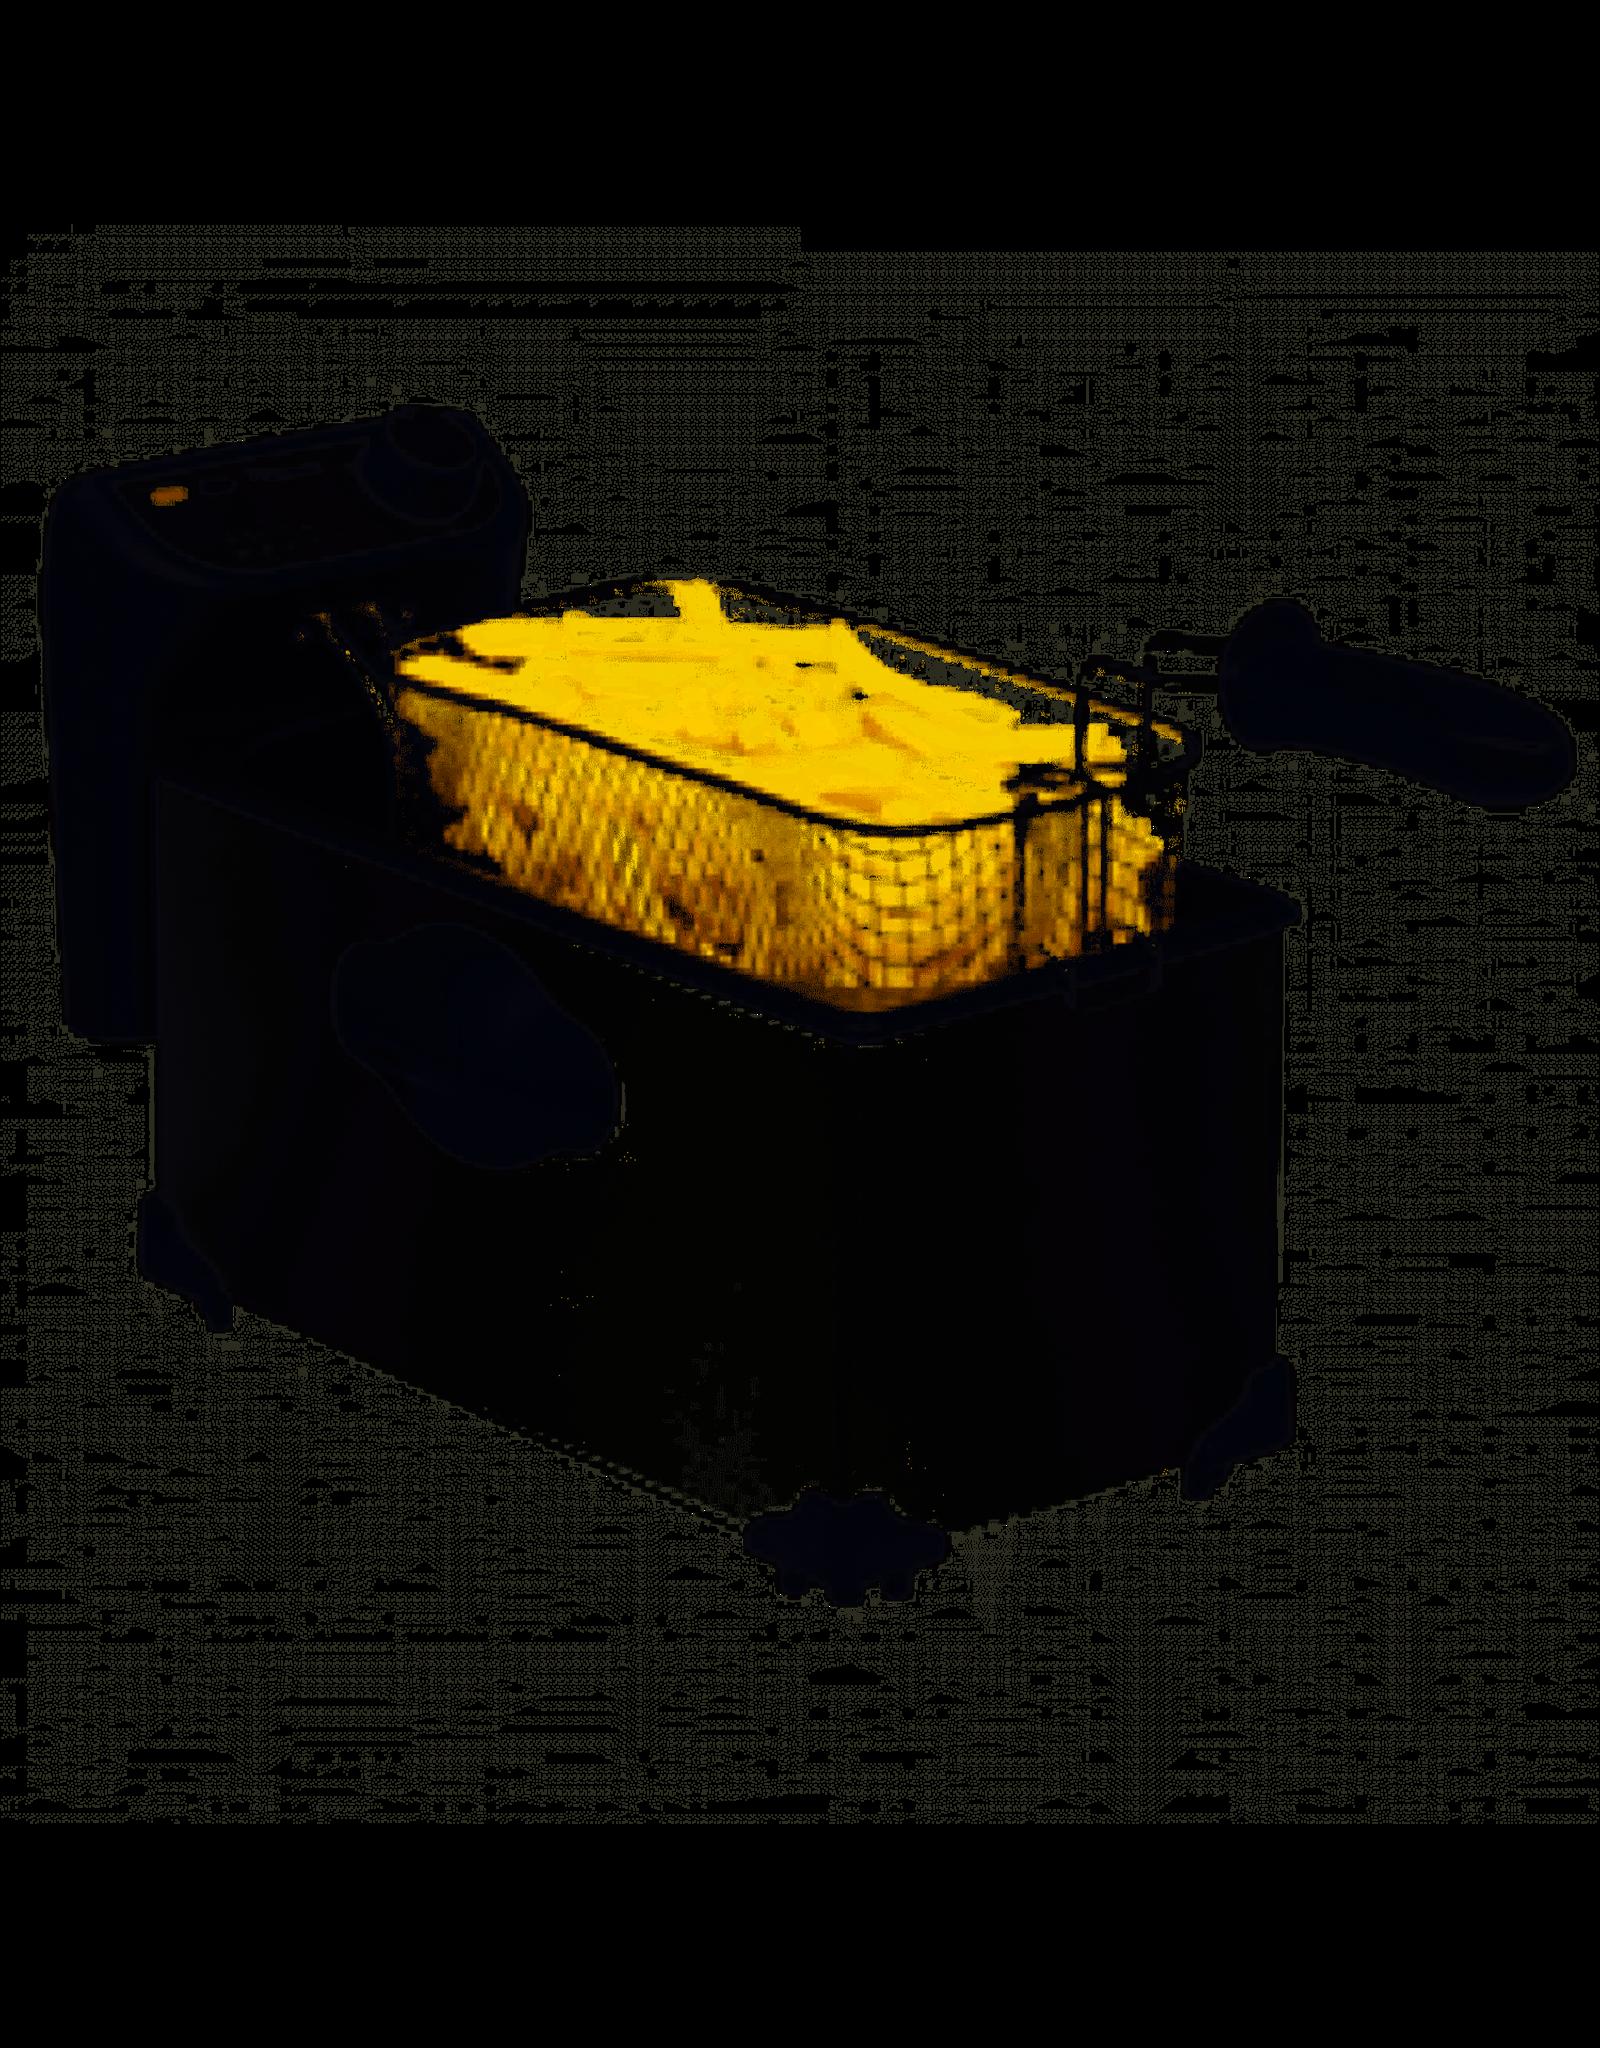 BESTRON Bestron AF351 - Frituurpan / friteuse 3.5 liter